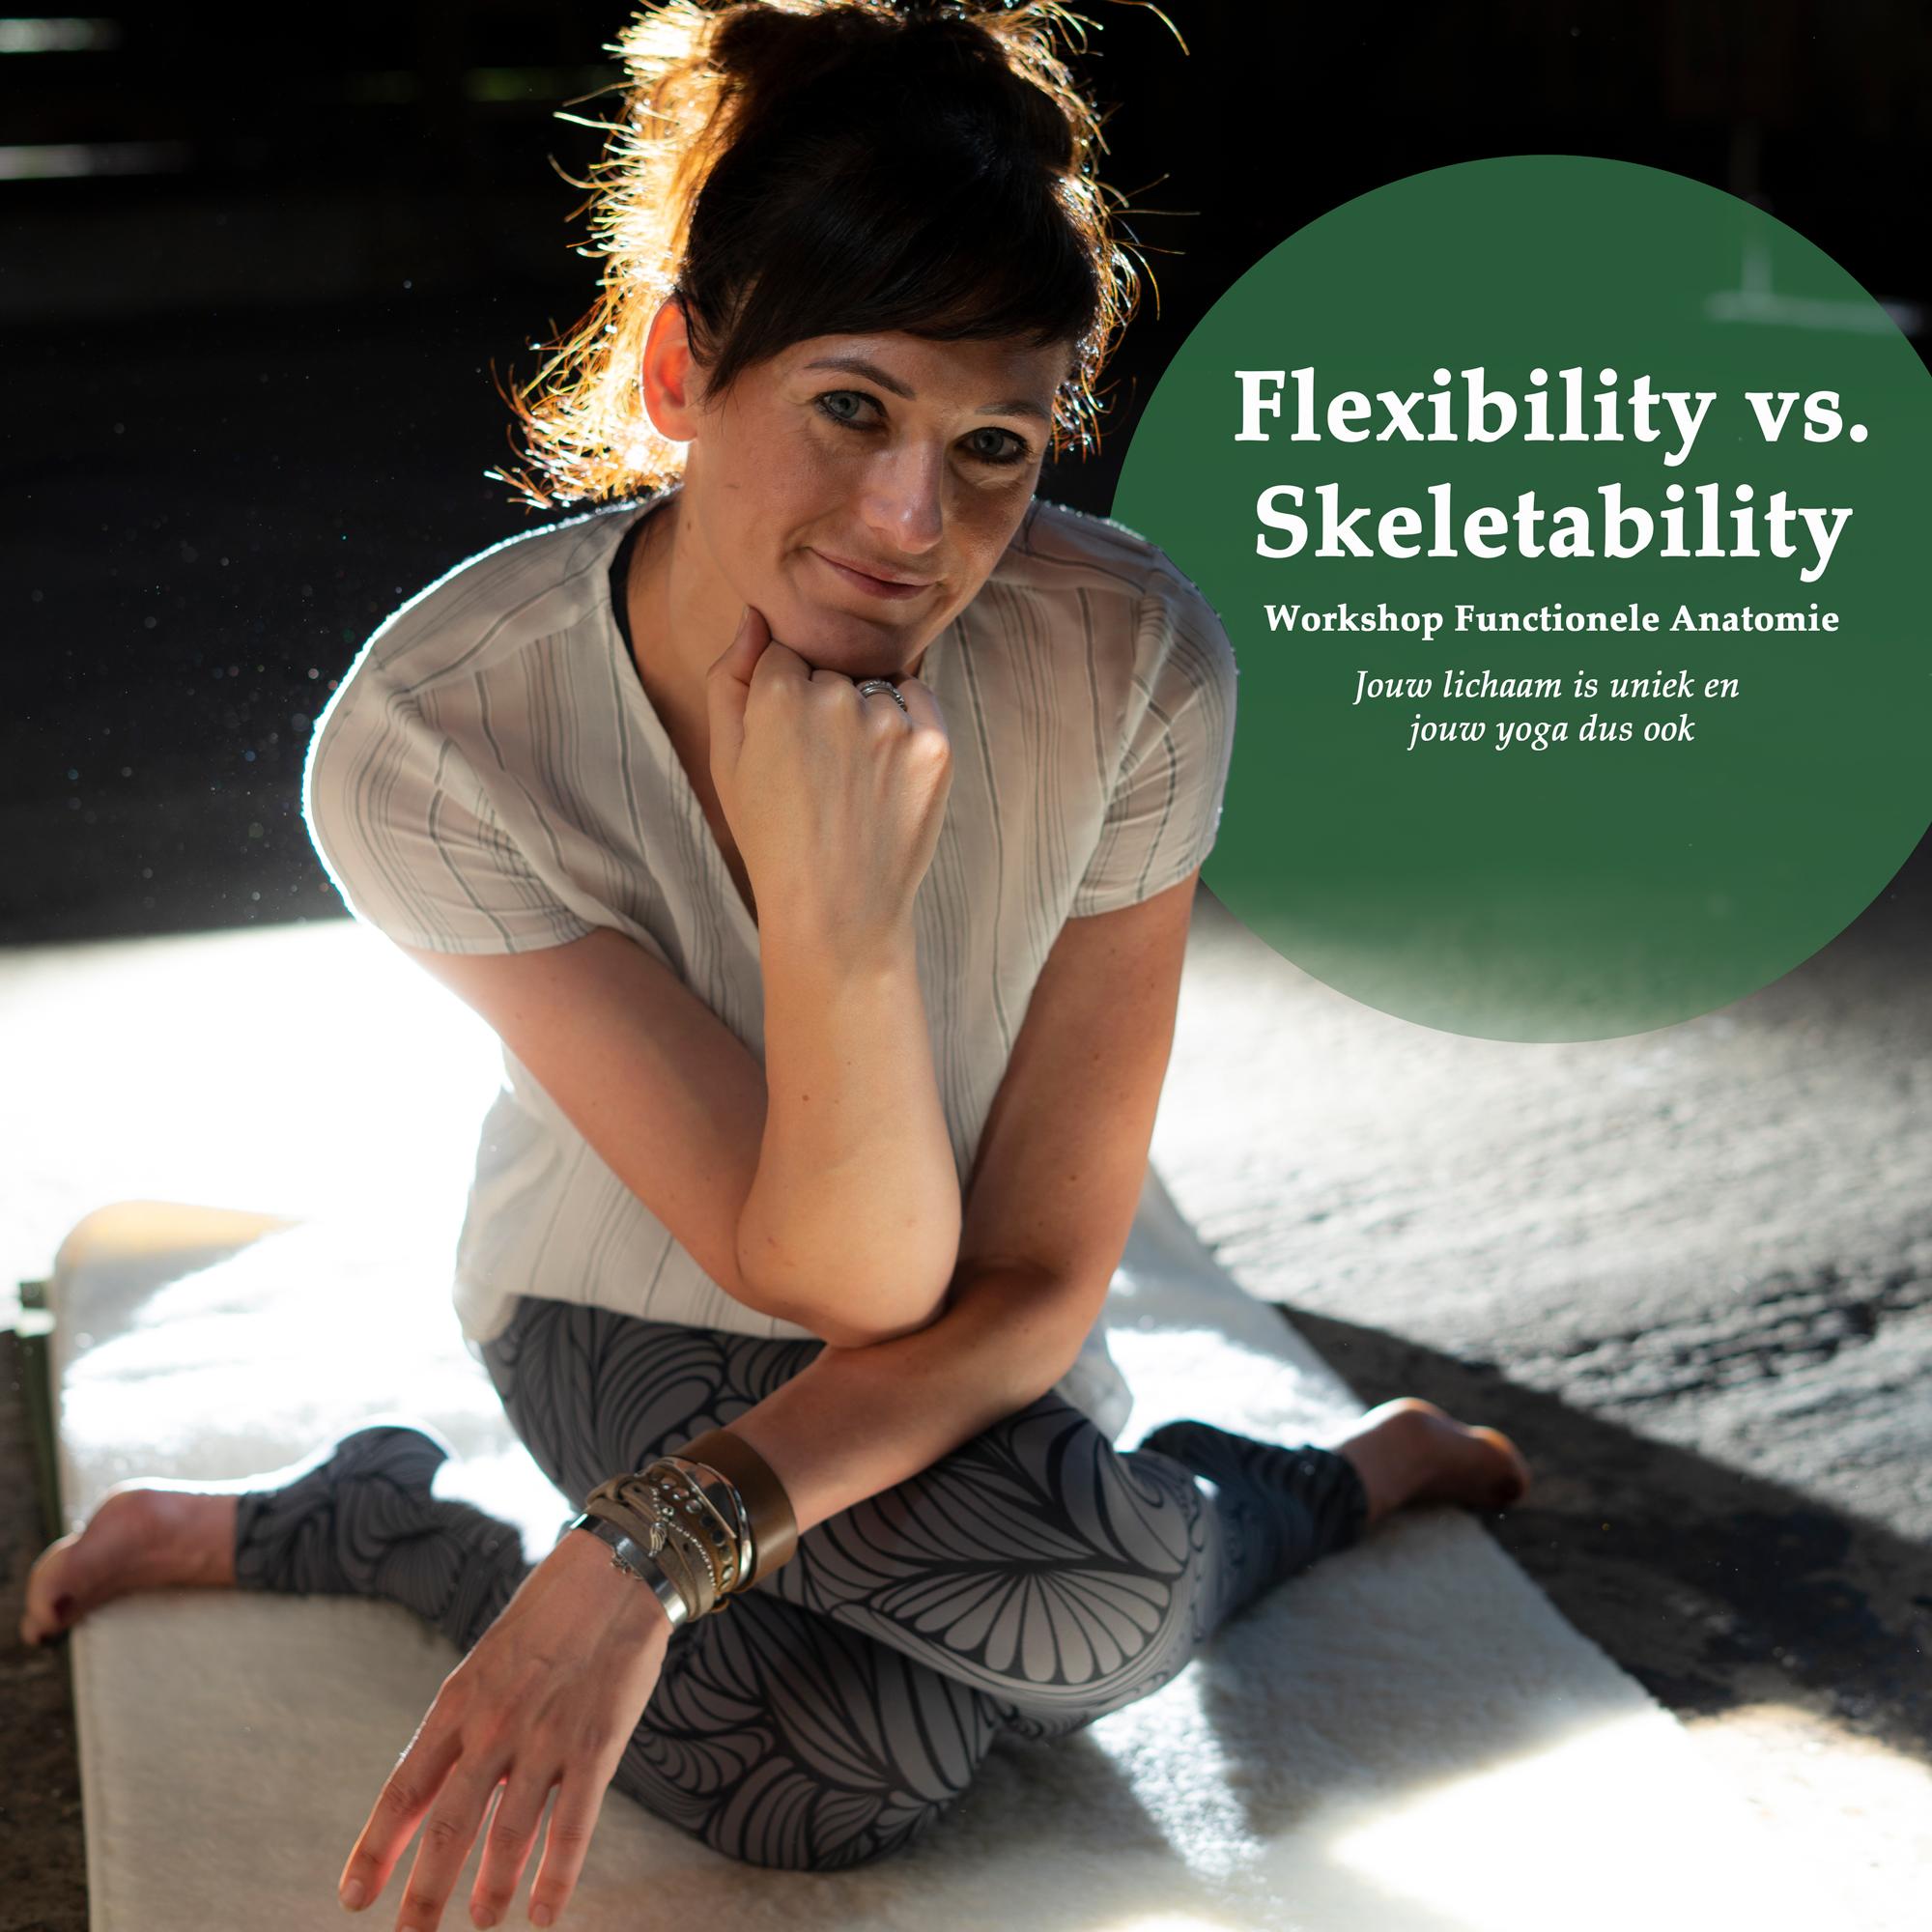 Angela Yoga Functionele Anatomie Flexibility vs Skeletability workshop